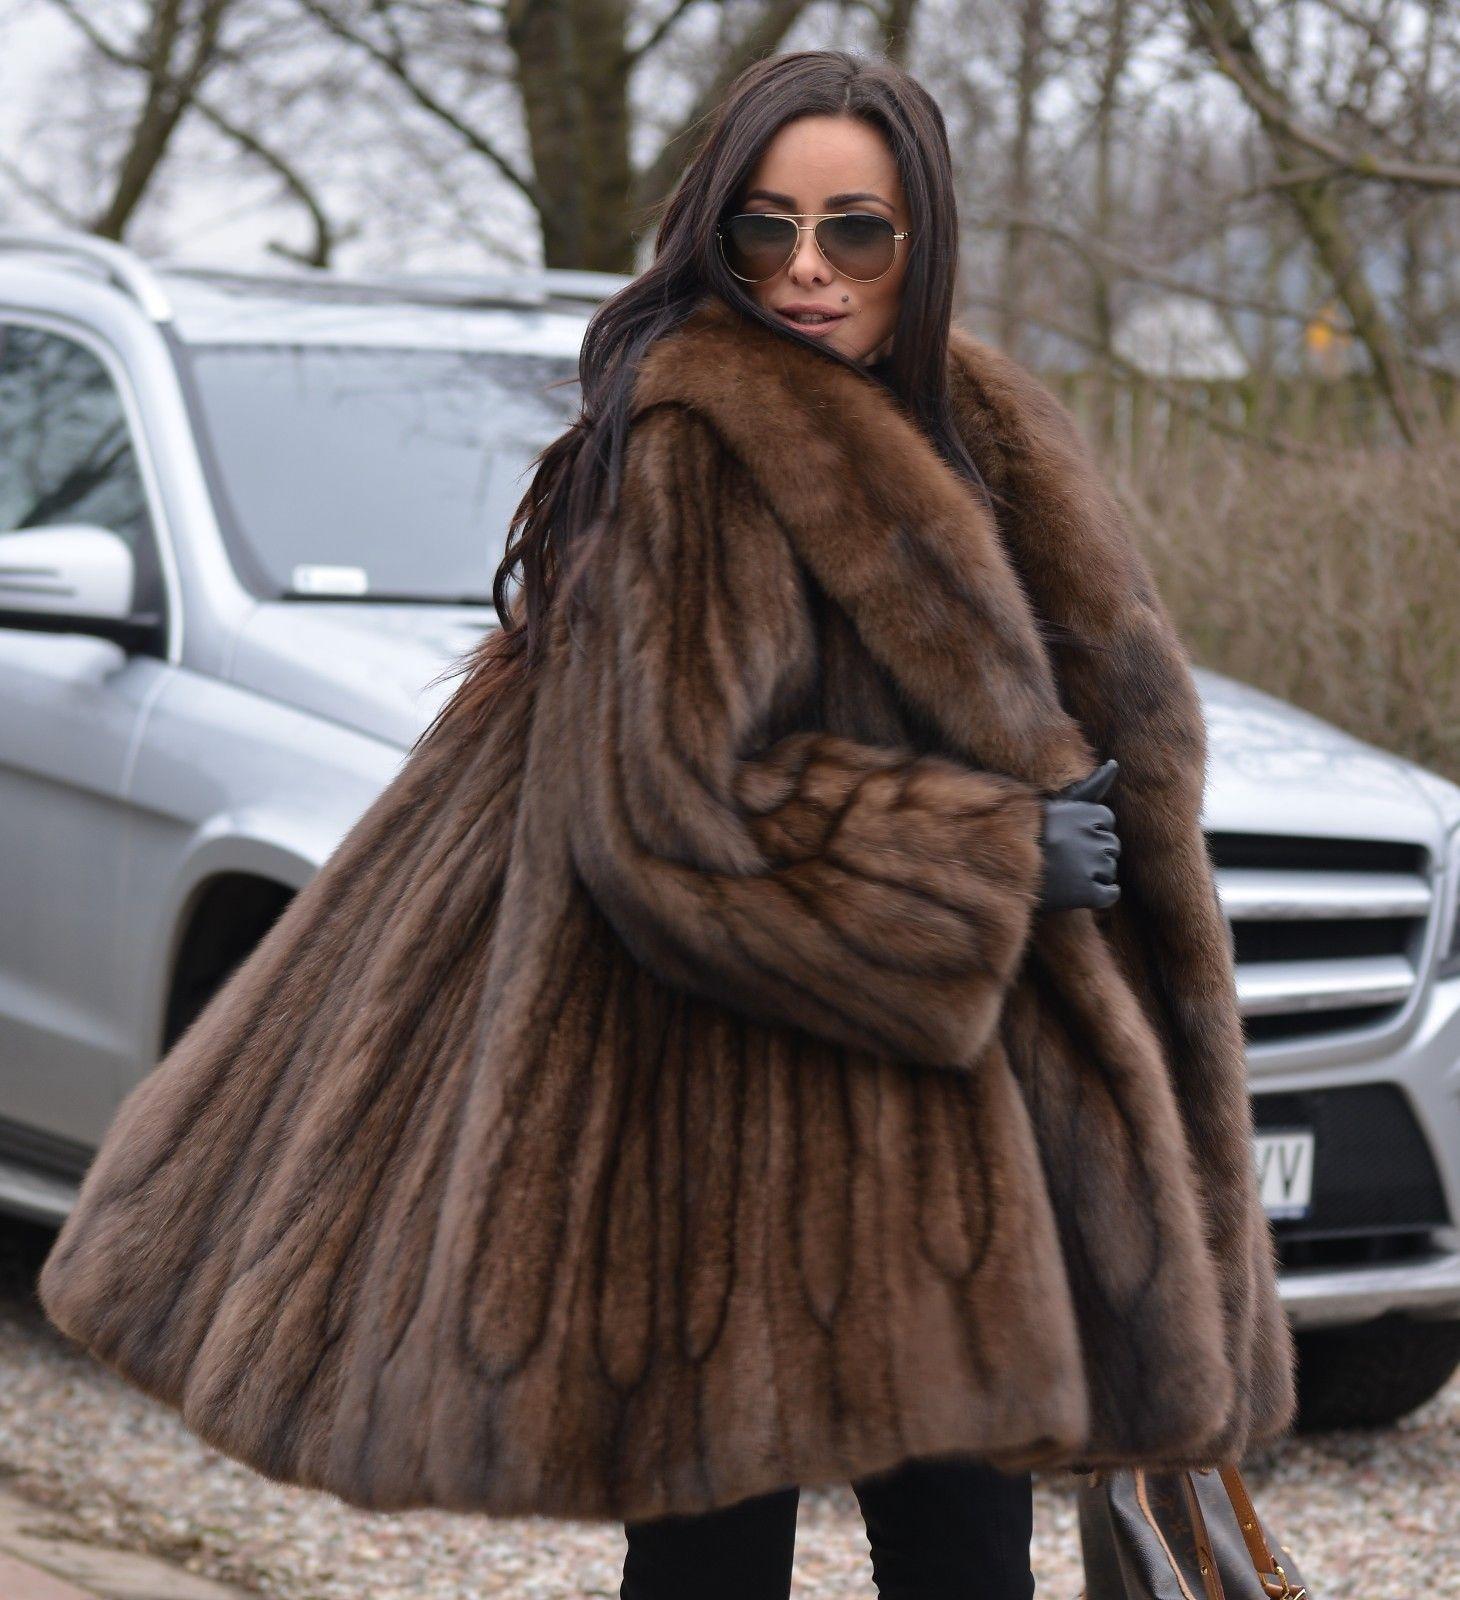 Pin By Michael Lake On Fabulous Furs In 2020 Fur Fashion Fashion Sable Coat